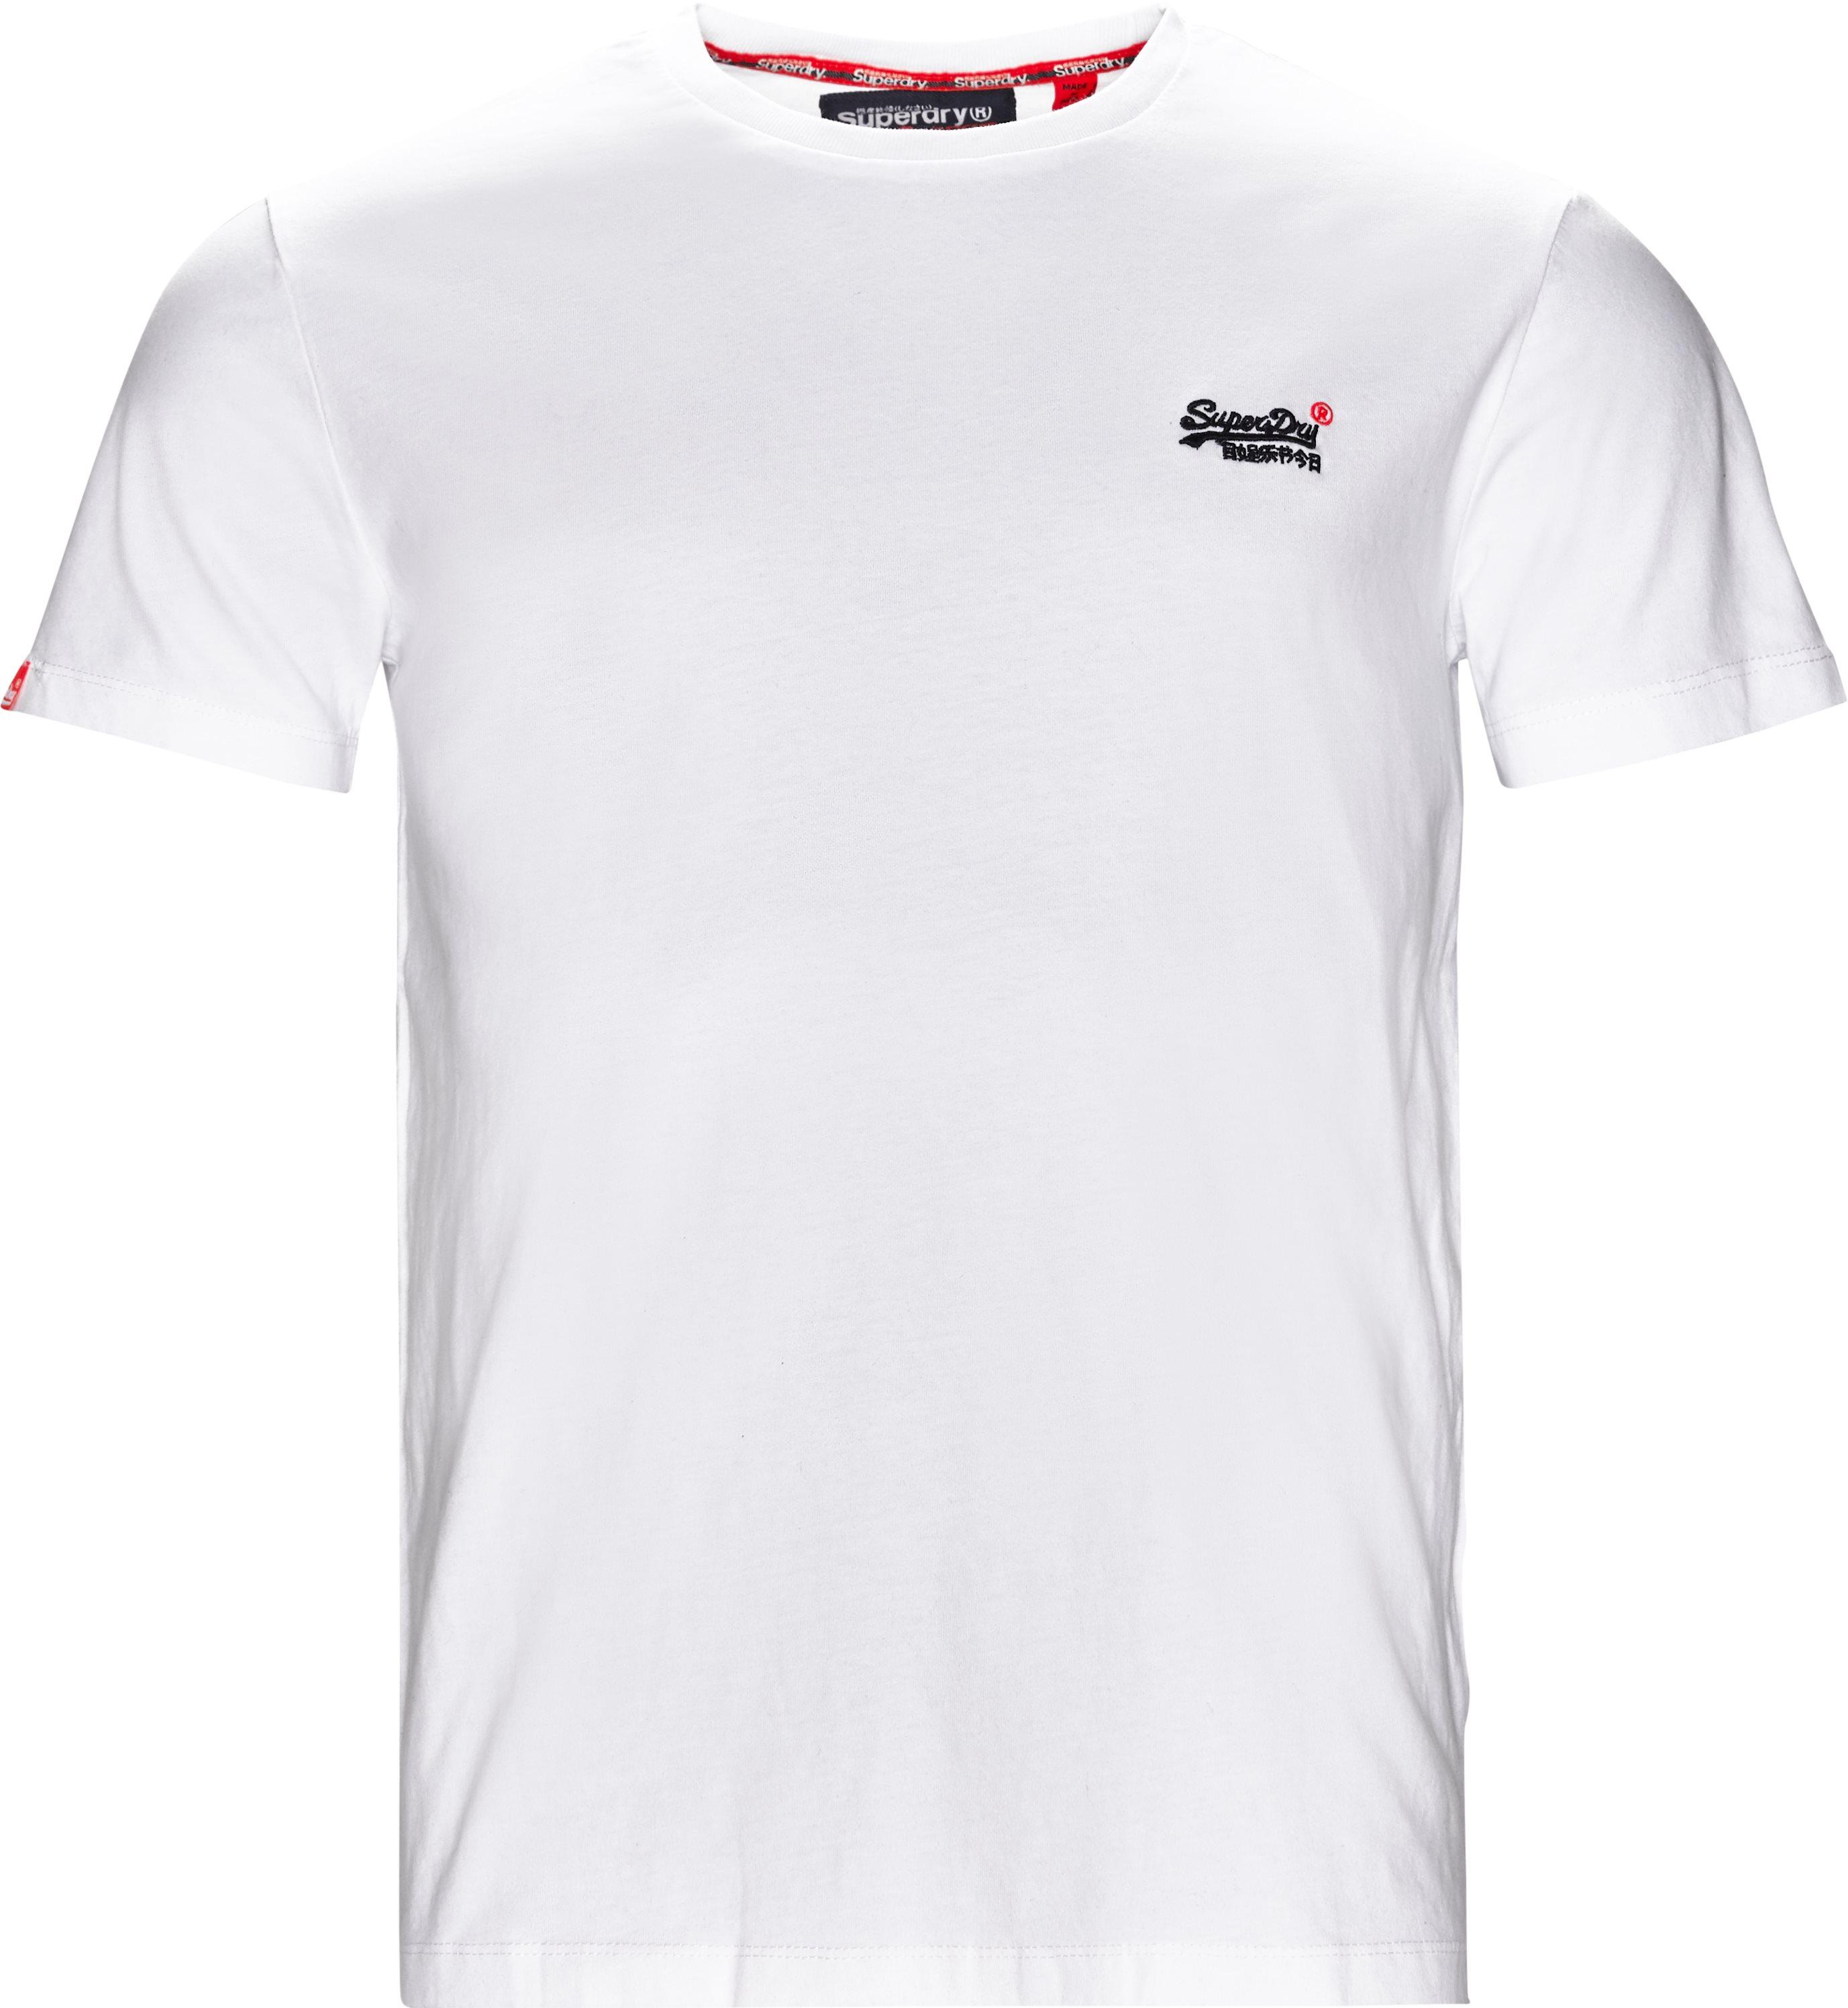 M101002 Tee - T-shirts - Regular fit - Hvid